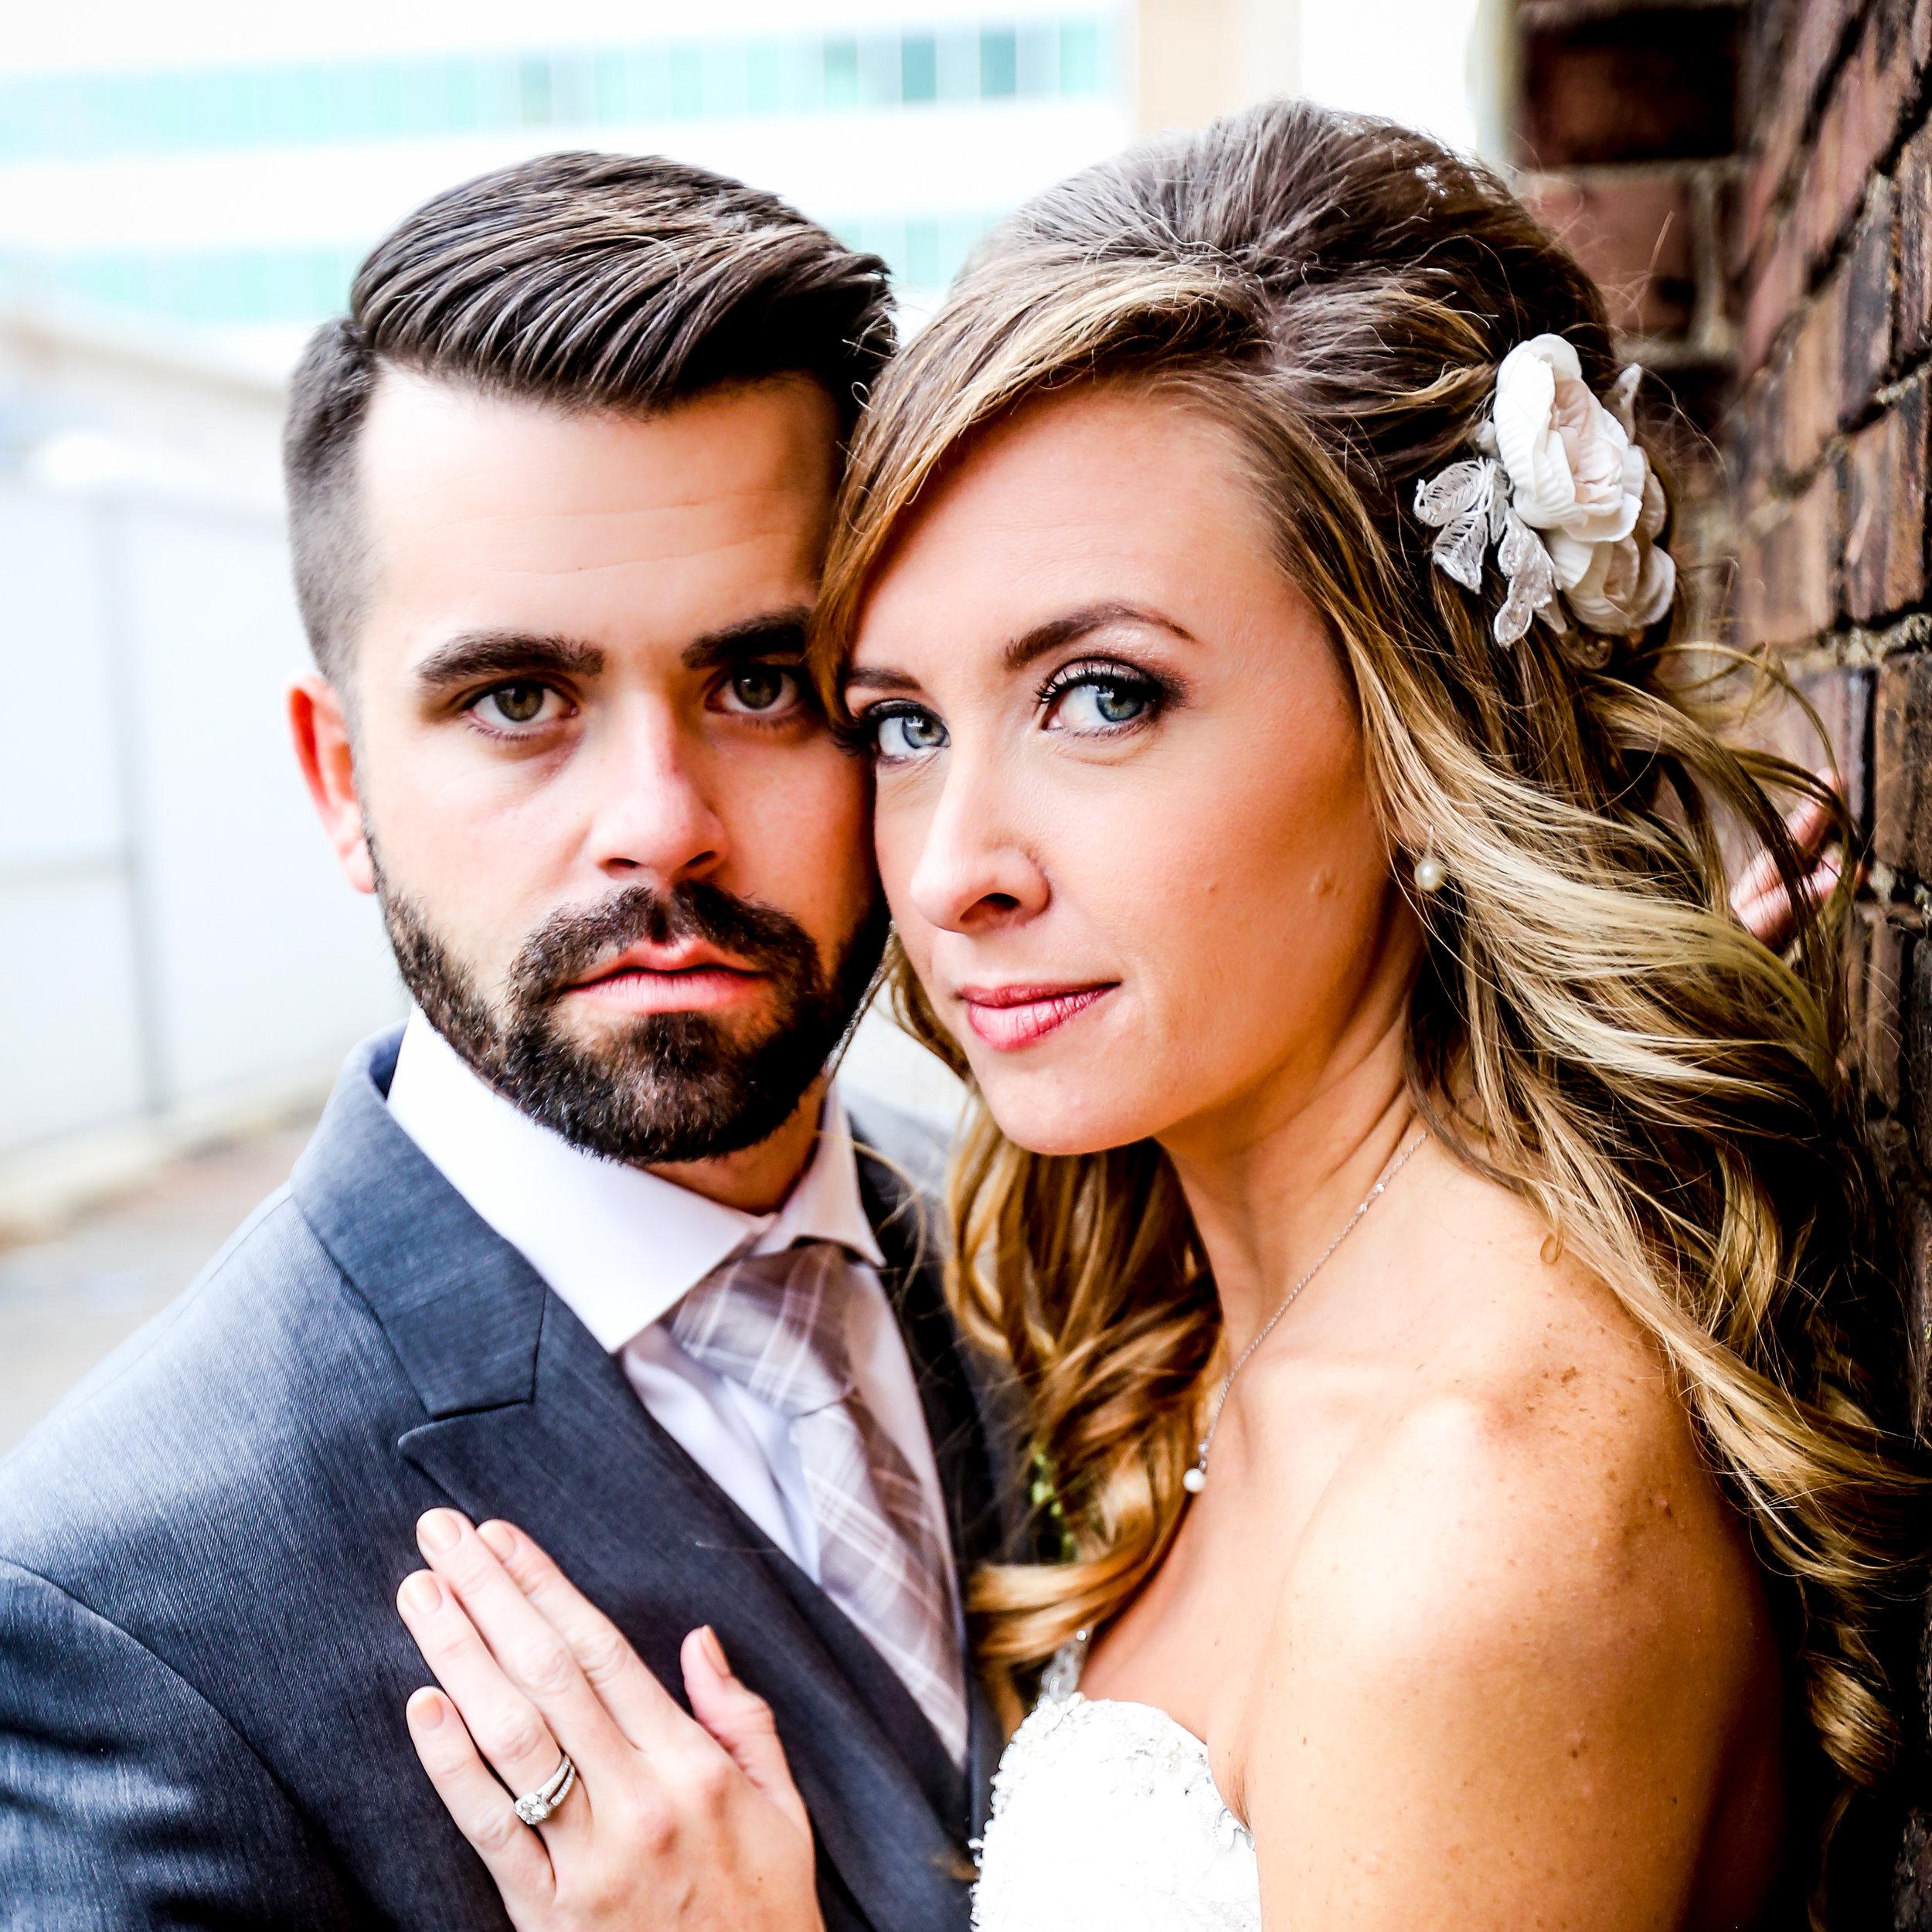 WeddingWebsite-19.jpg